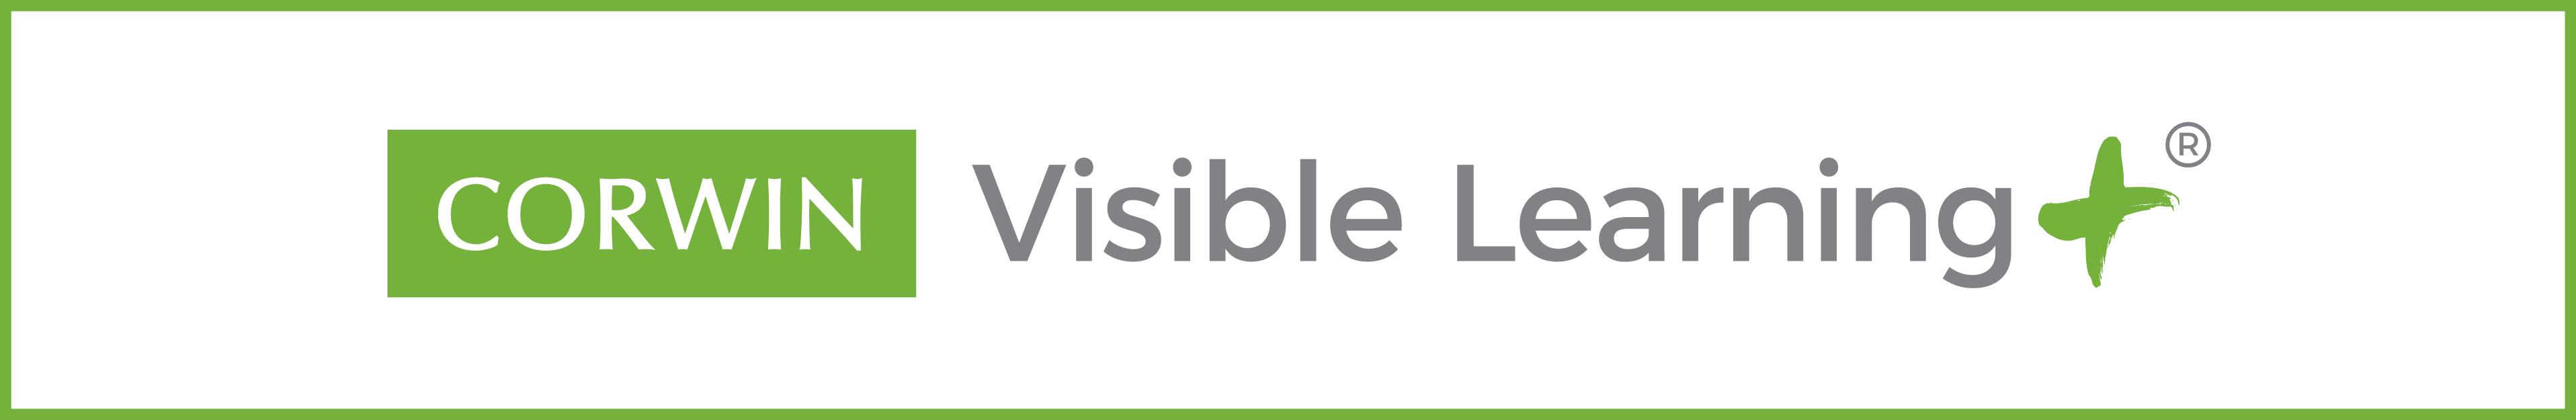 Corwin Visible Learning+